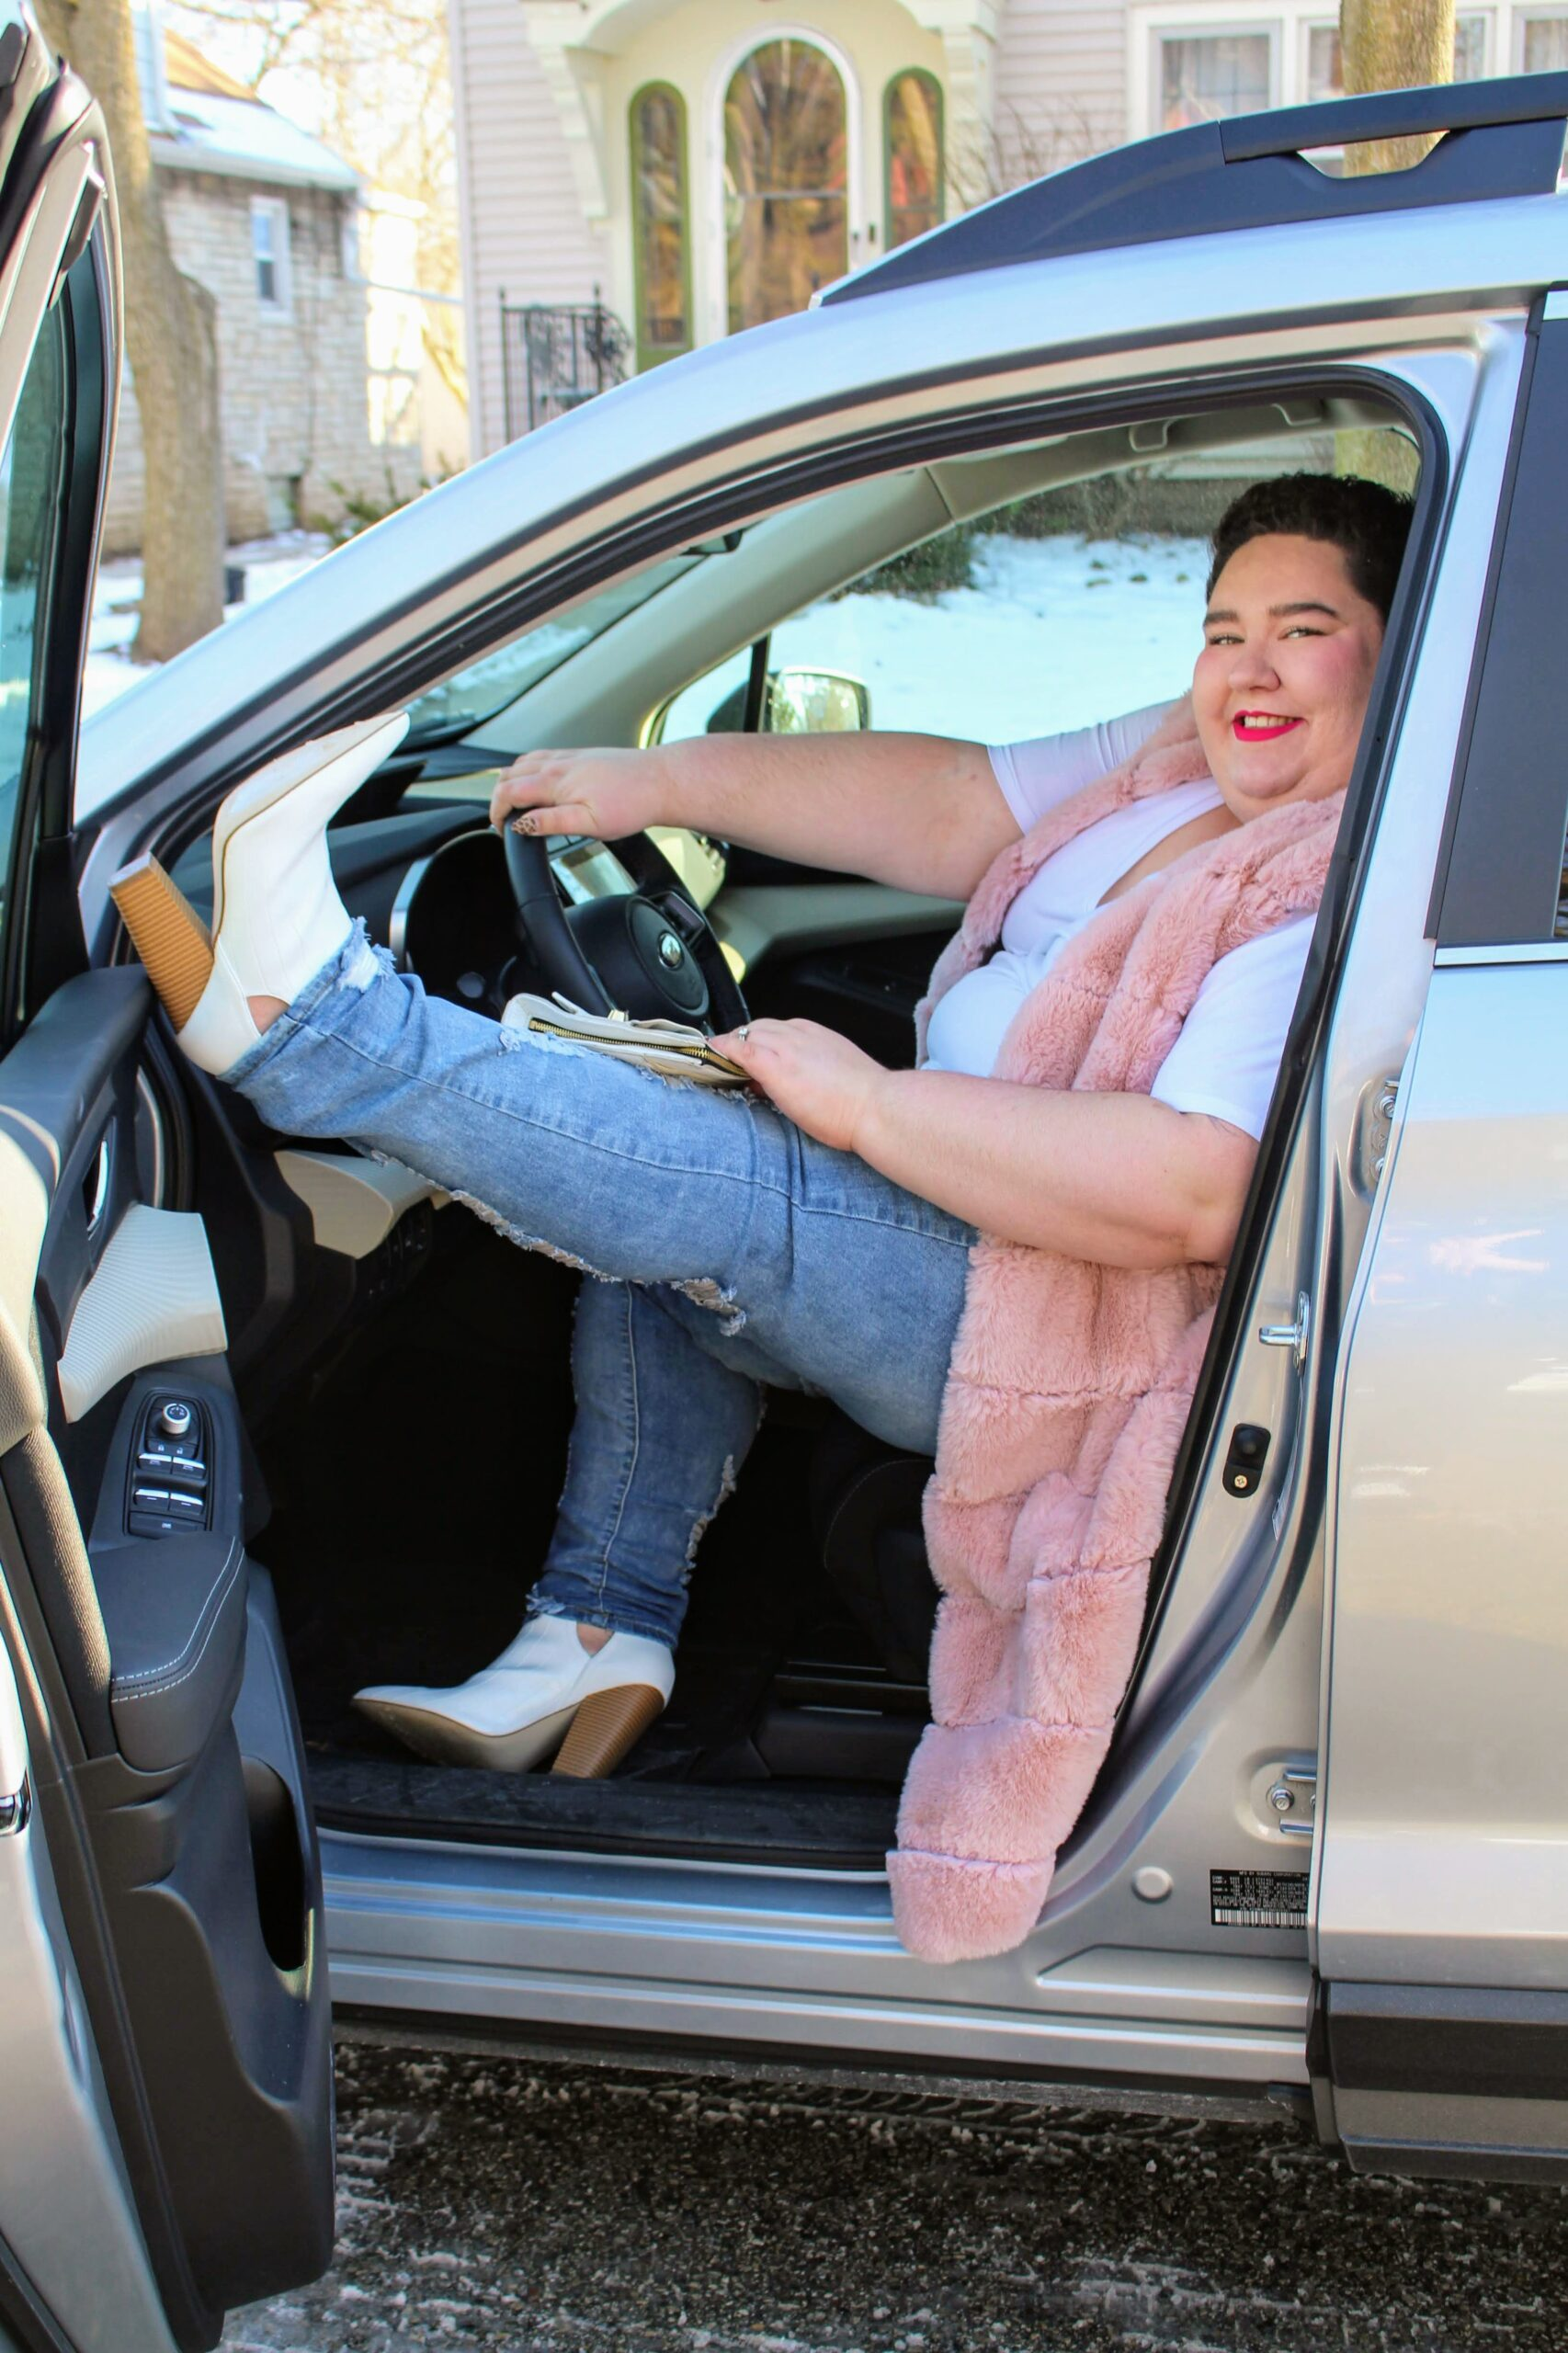 Chaya Milchtein plus size automotive educator